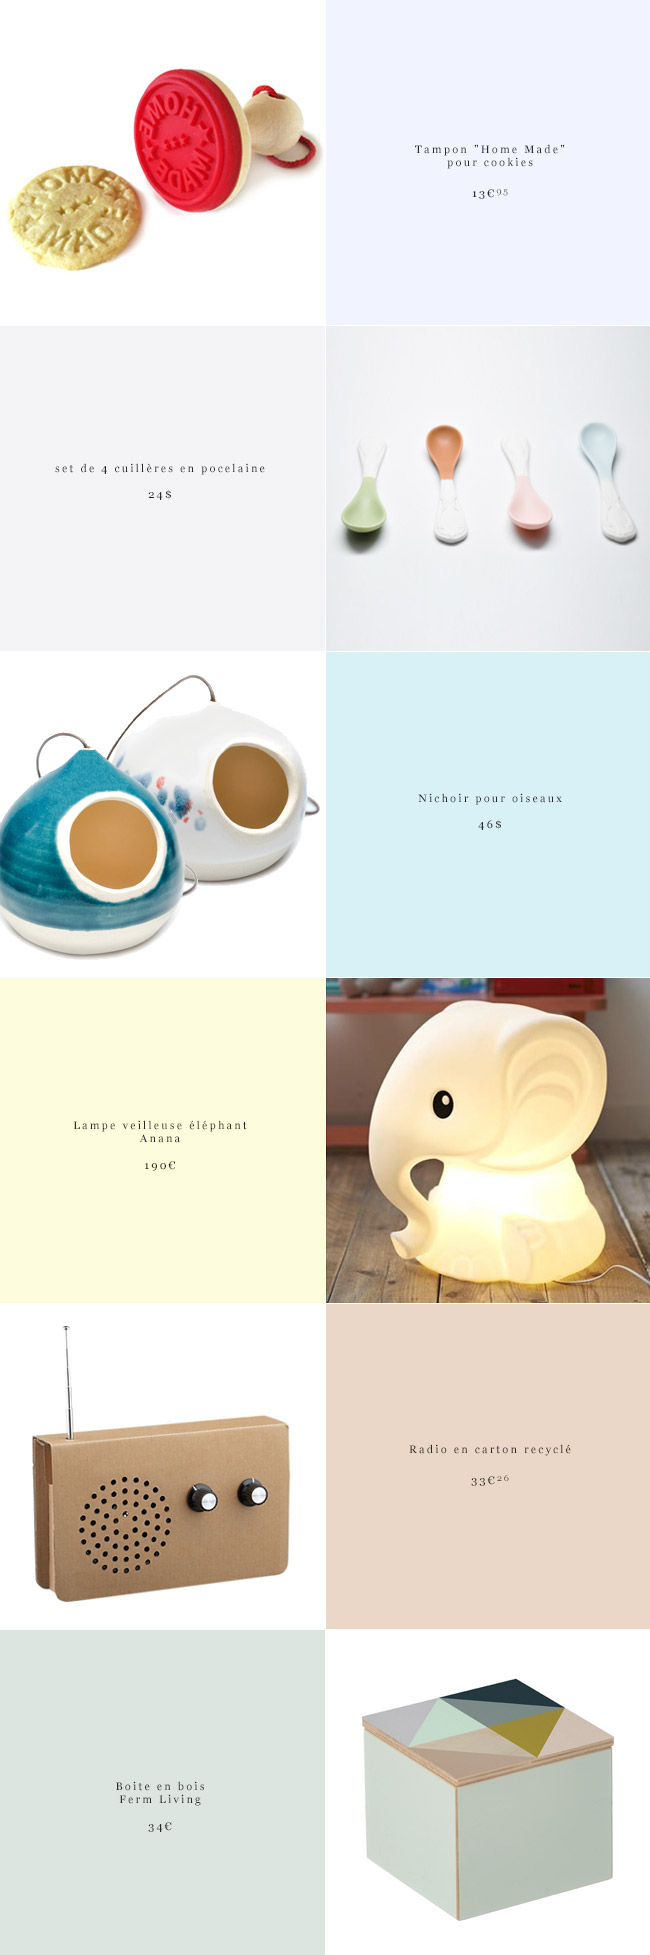 Idées cadeaux de Noel #2 | Poligom